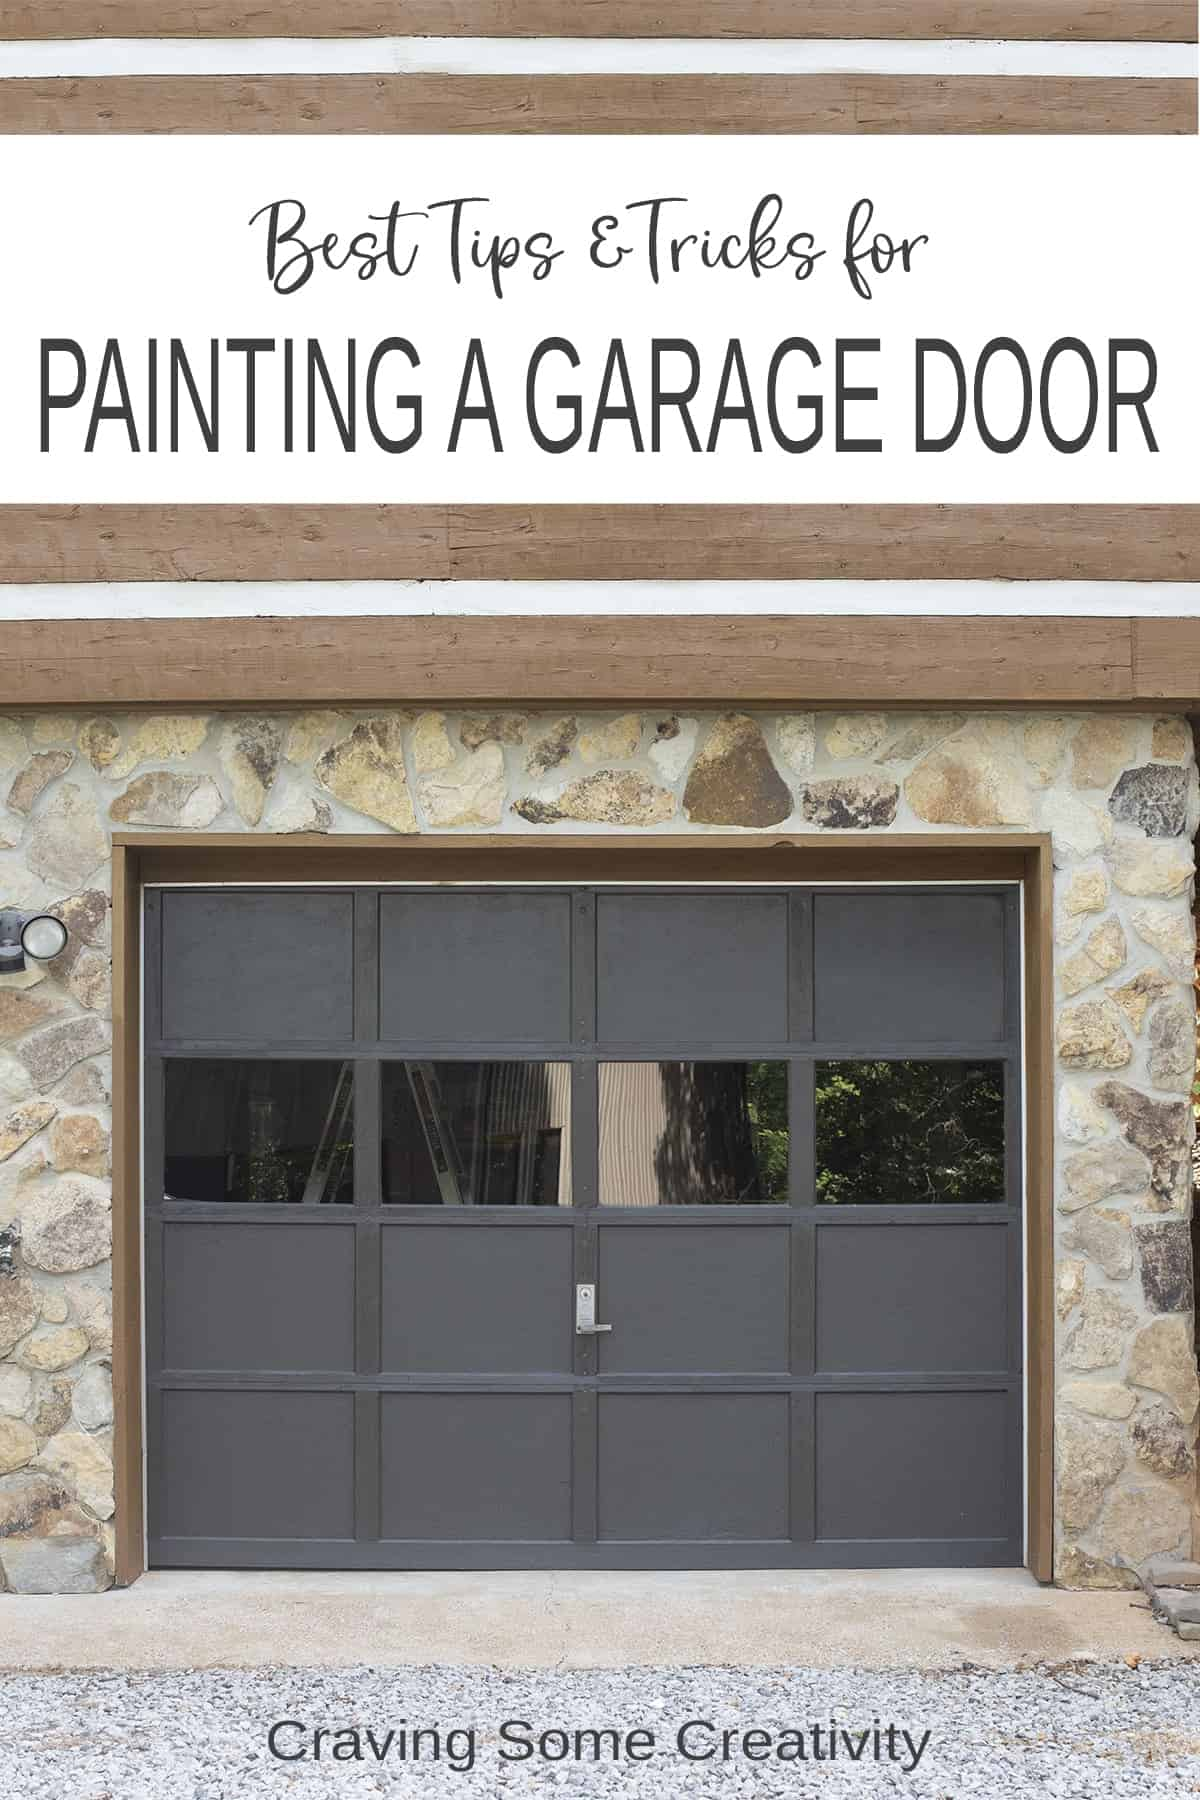 Front of painted grey garage door with stone facing around it.